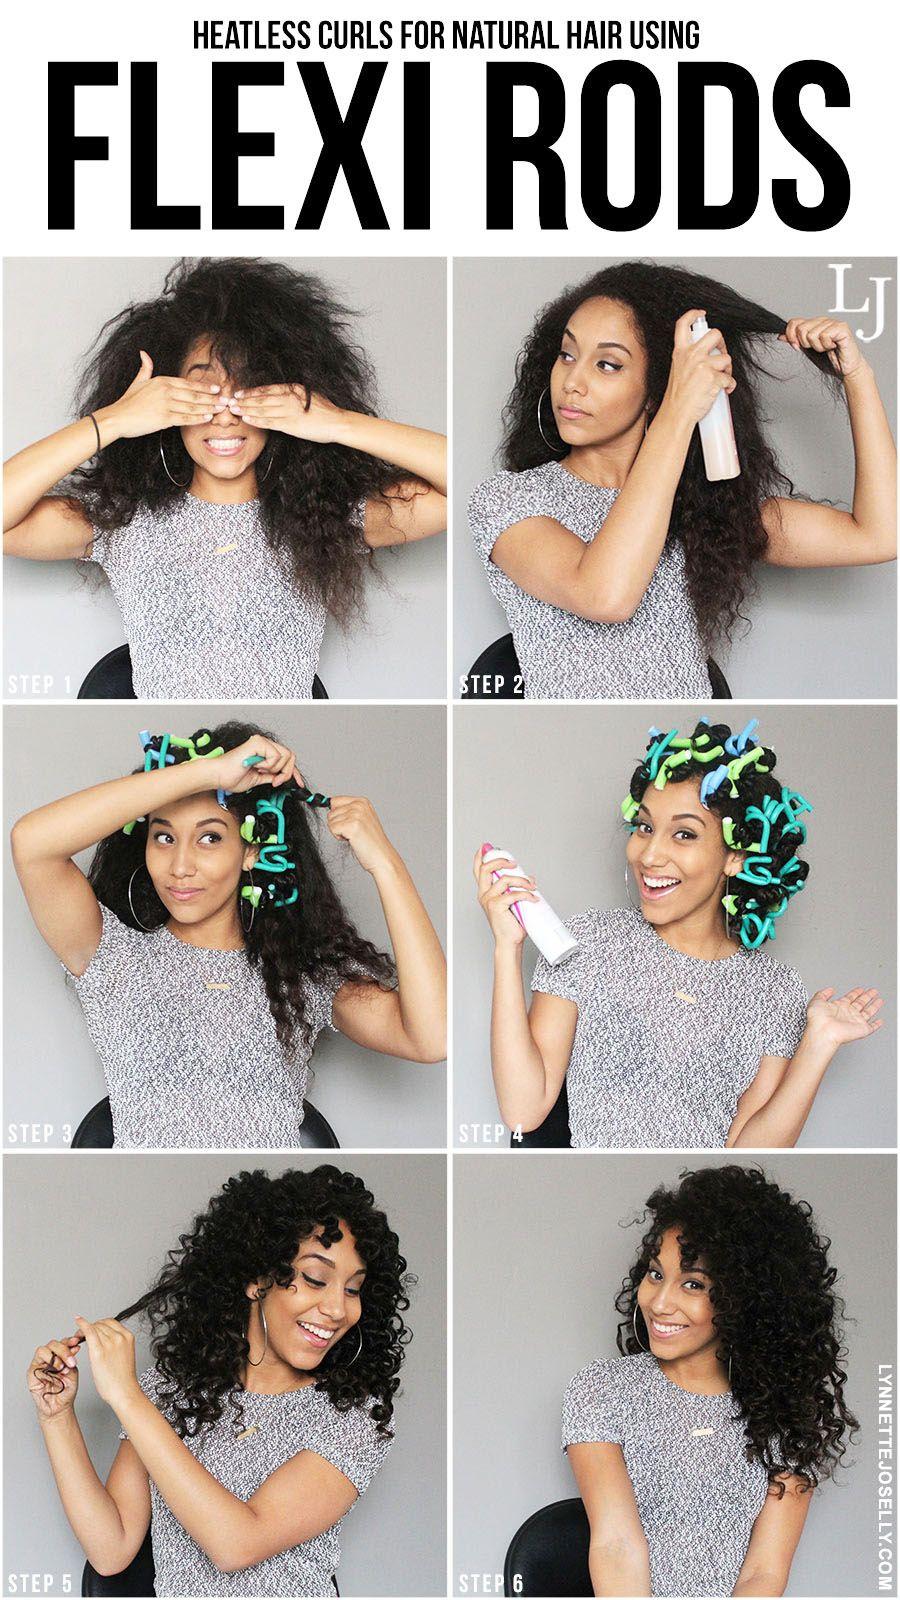 Heatless Curls For Natural Hair Using Flexi Rods Natural Hair Styles Hair Styles Curly Hair Styles